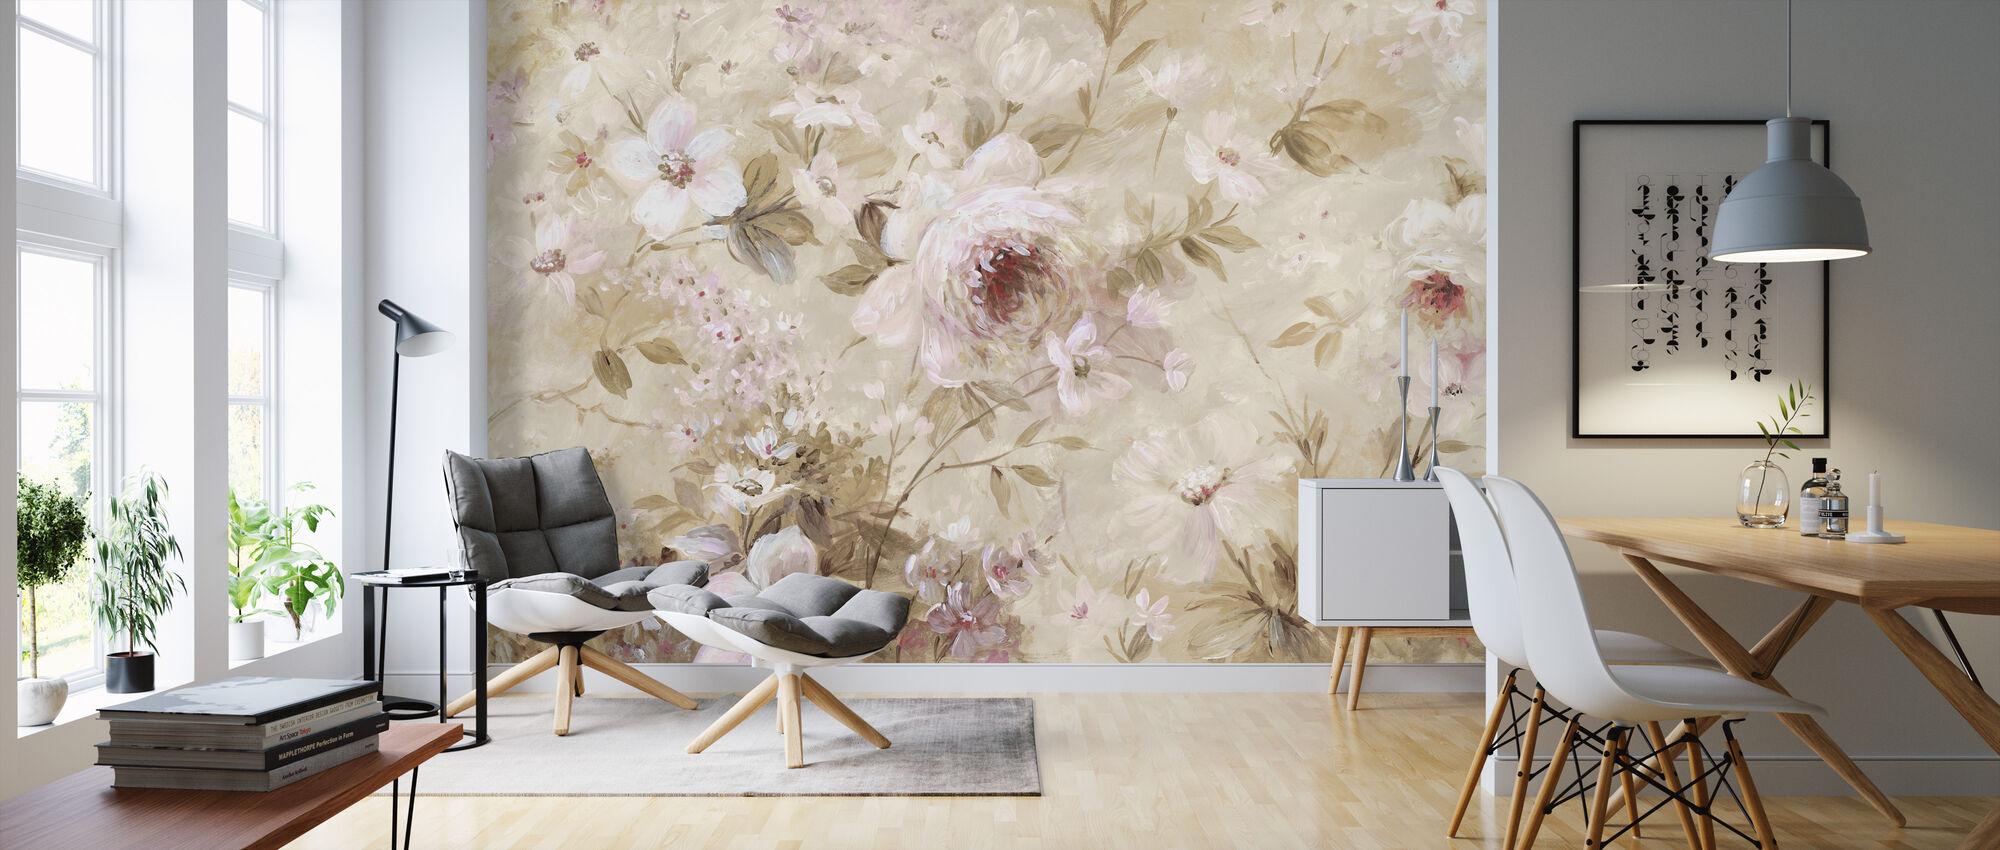 Floral Cream - Wallpaper - Living Room